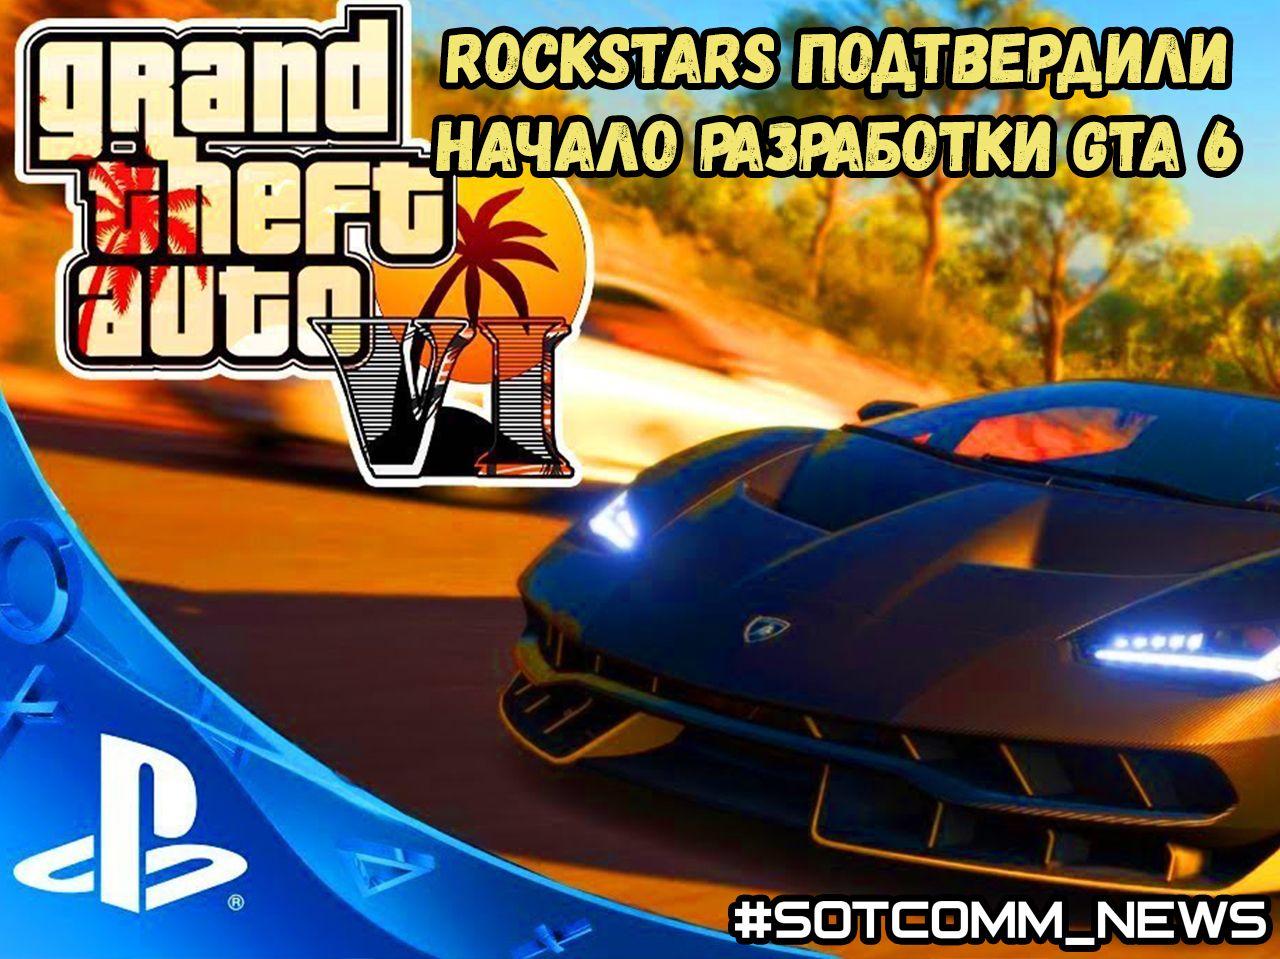 Rockstars подтвердили начало разработки GTA 6